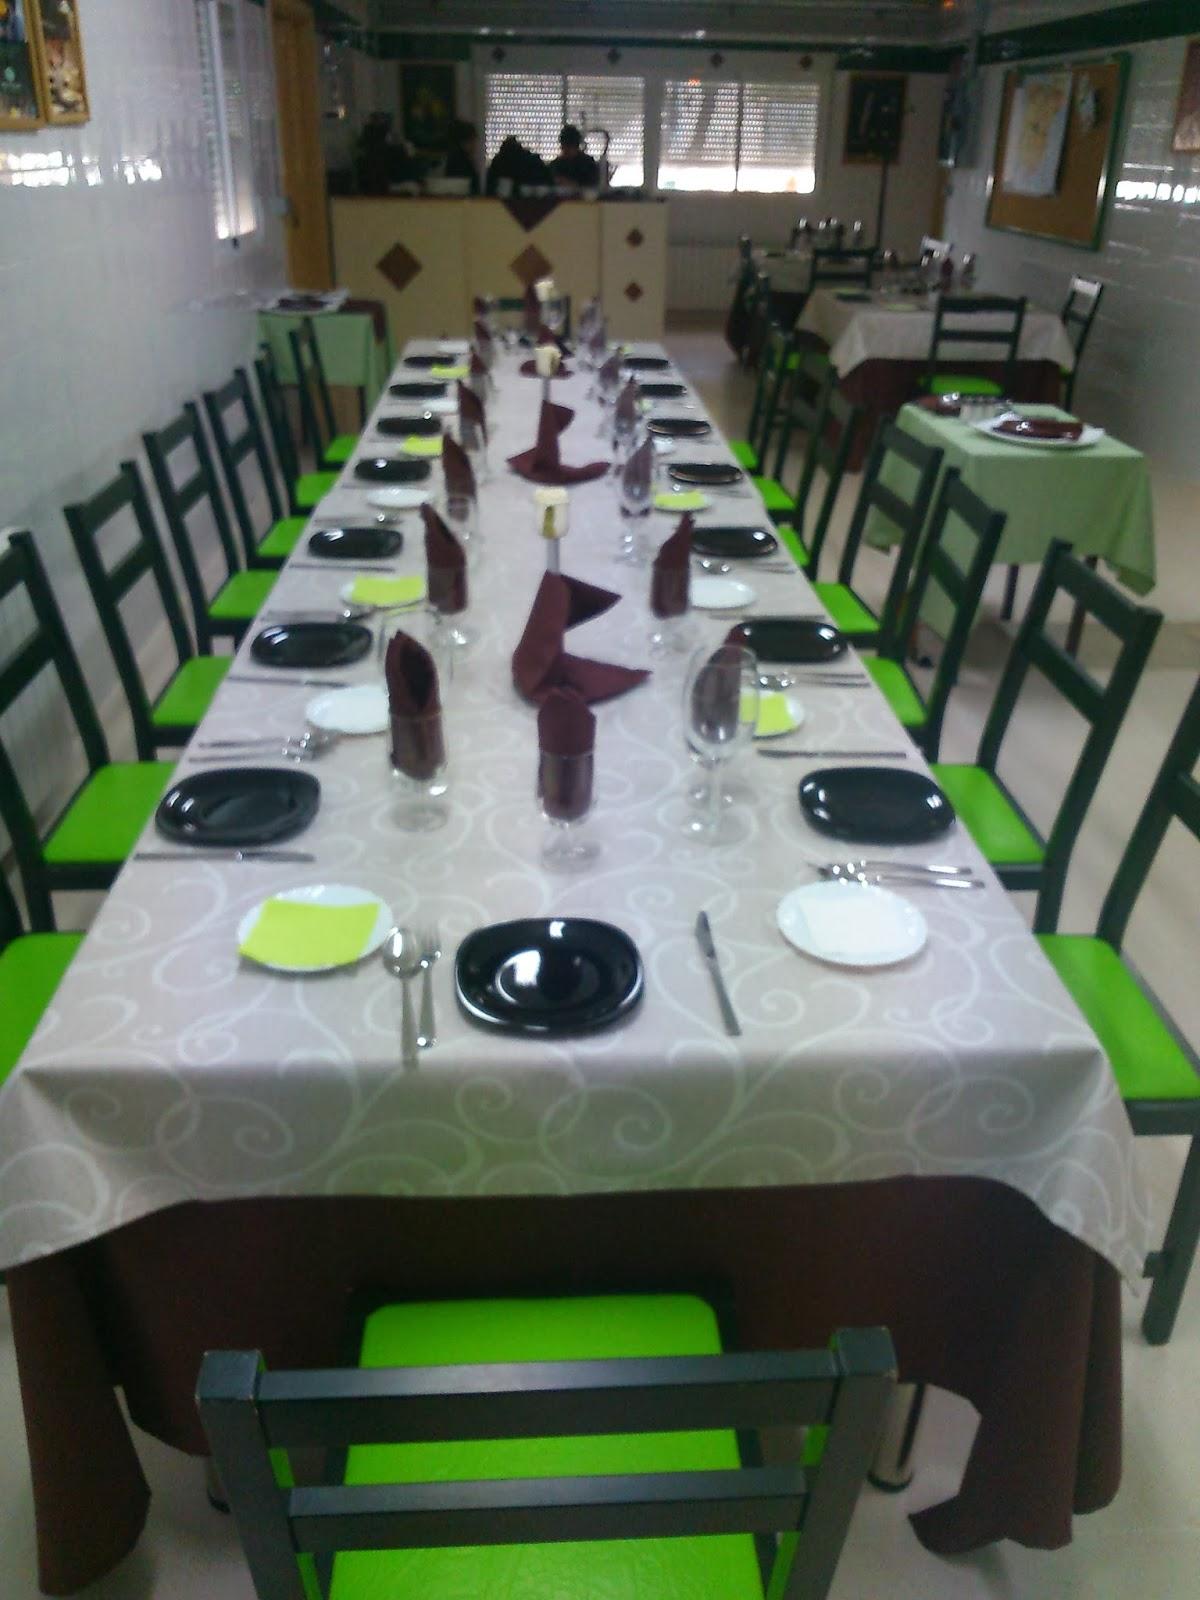 Formaci n profesional b sica de ayudante de restaurante for Formacion profesional cocina